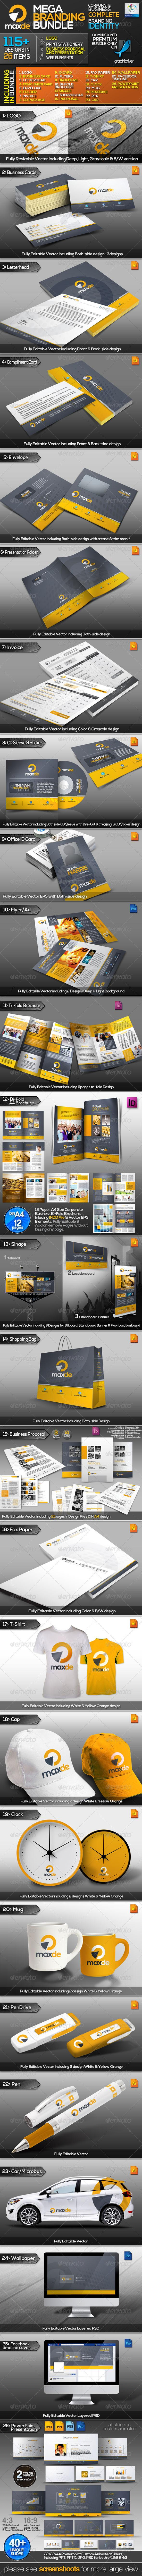 Maxde: Corporate Business ID Mega Branding Bundle - Stationery Print Templates